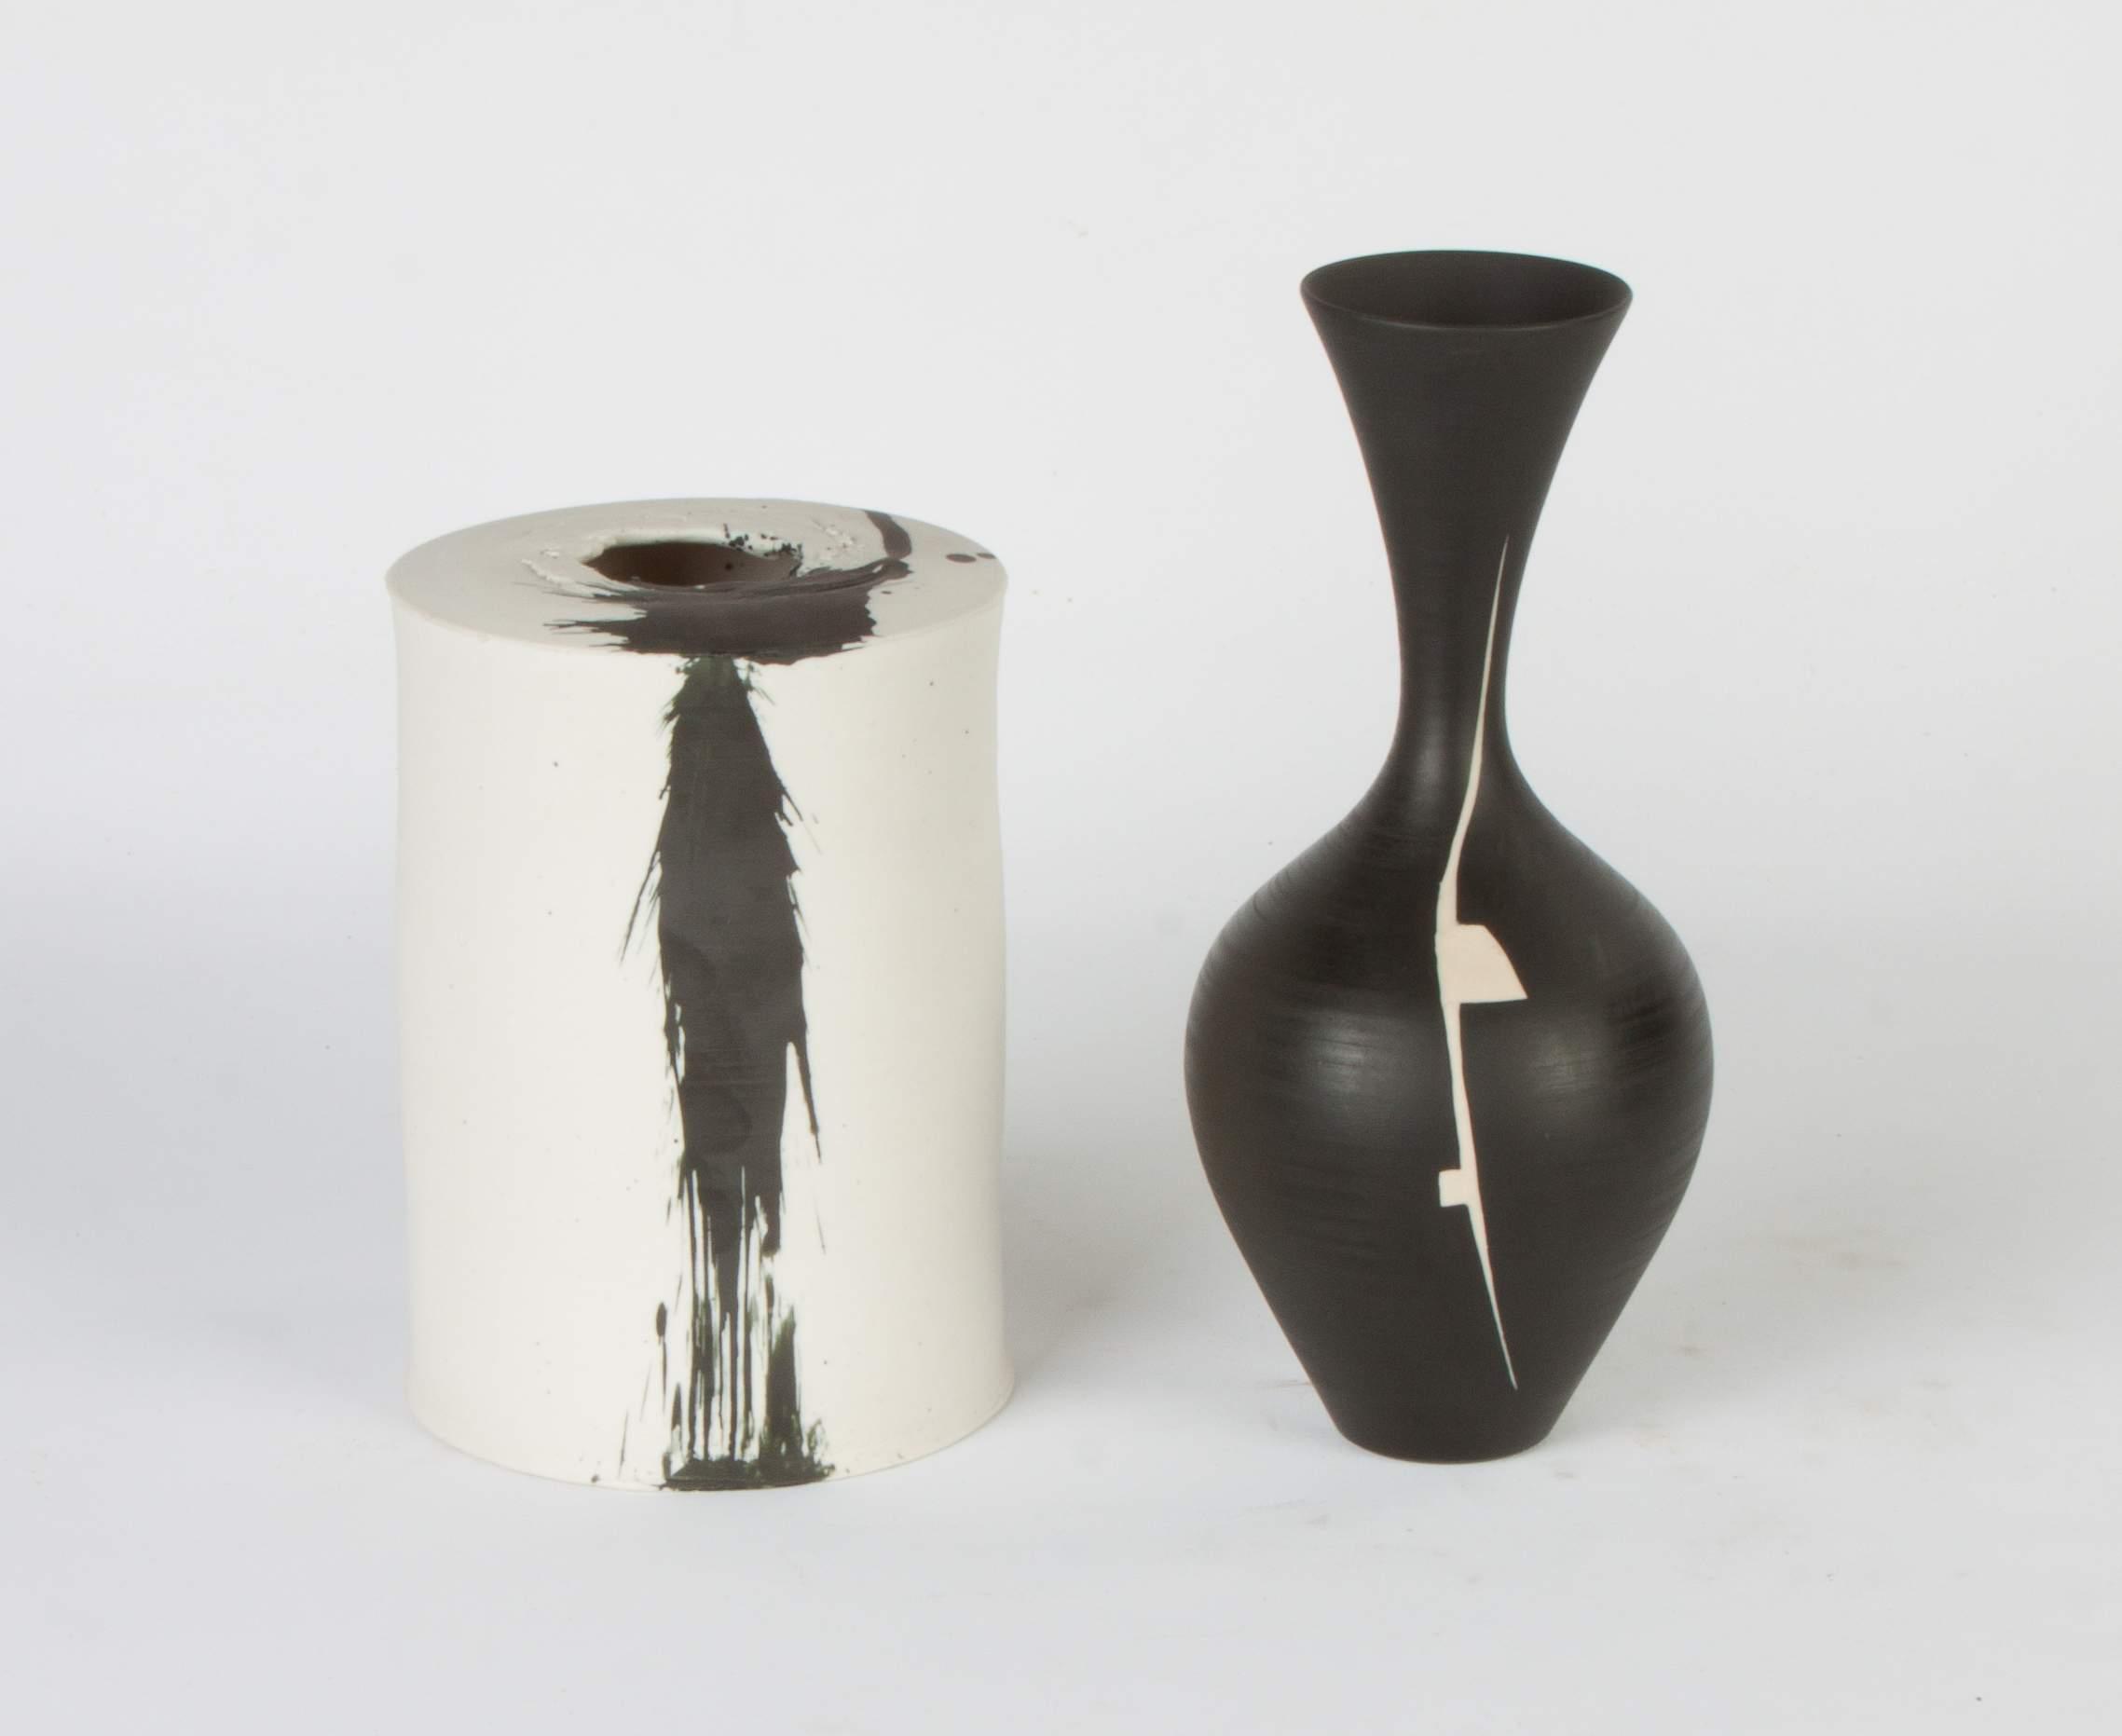 Two black and white contemporary ceramic vases cottone auctions two black and white contemporary ceramic vases reviewsmspy